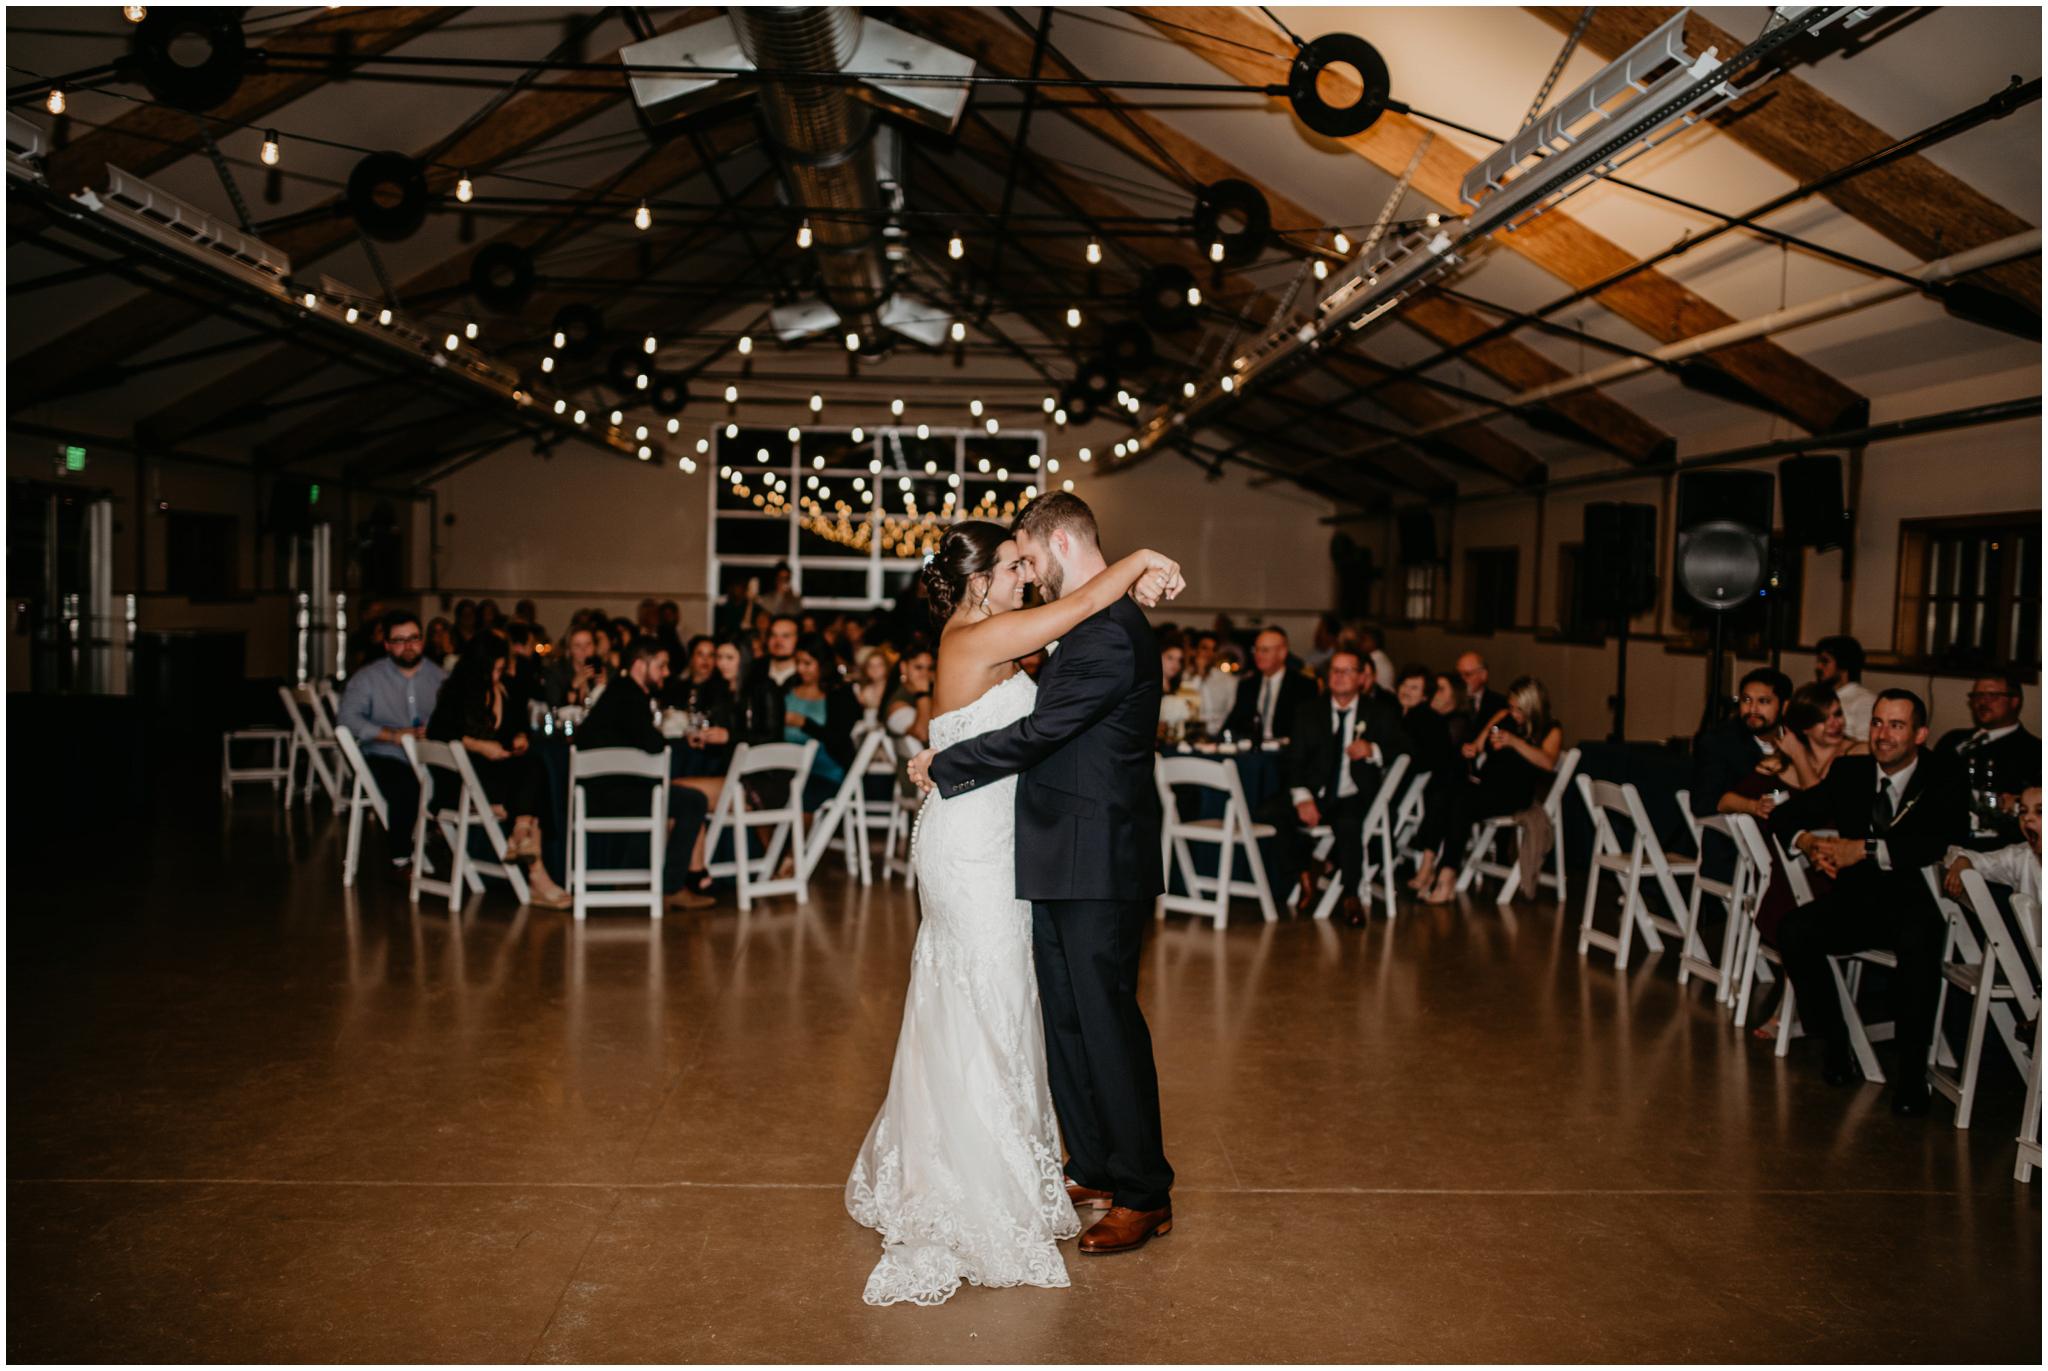 ashley-tj-the-pickering-barn-winter-wedding-seattle-photographer-084.jpg